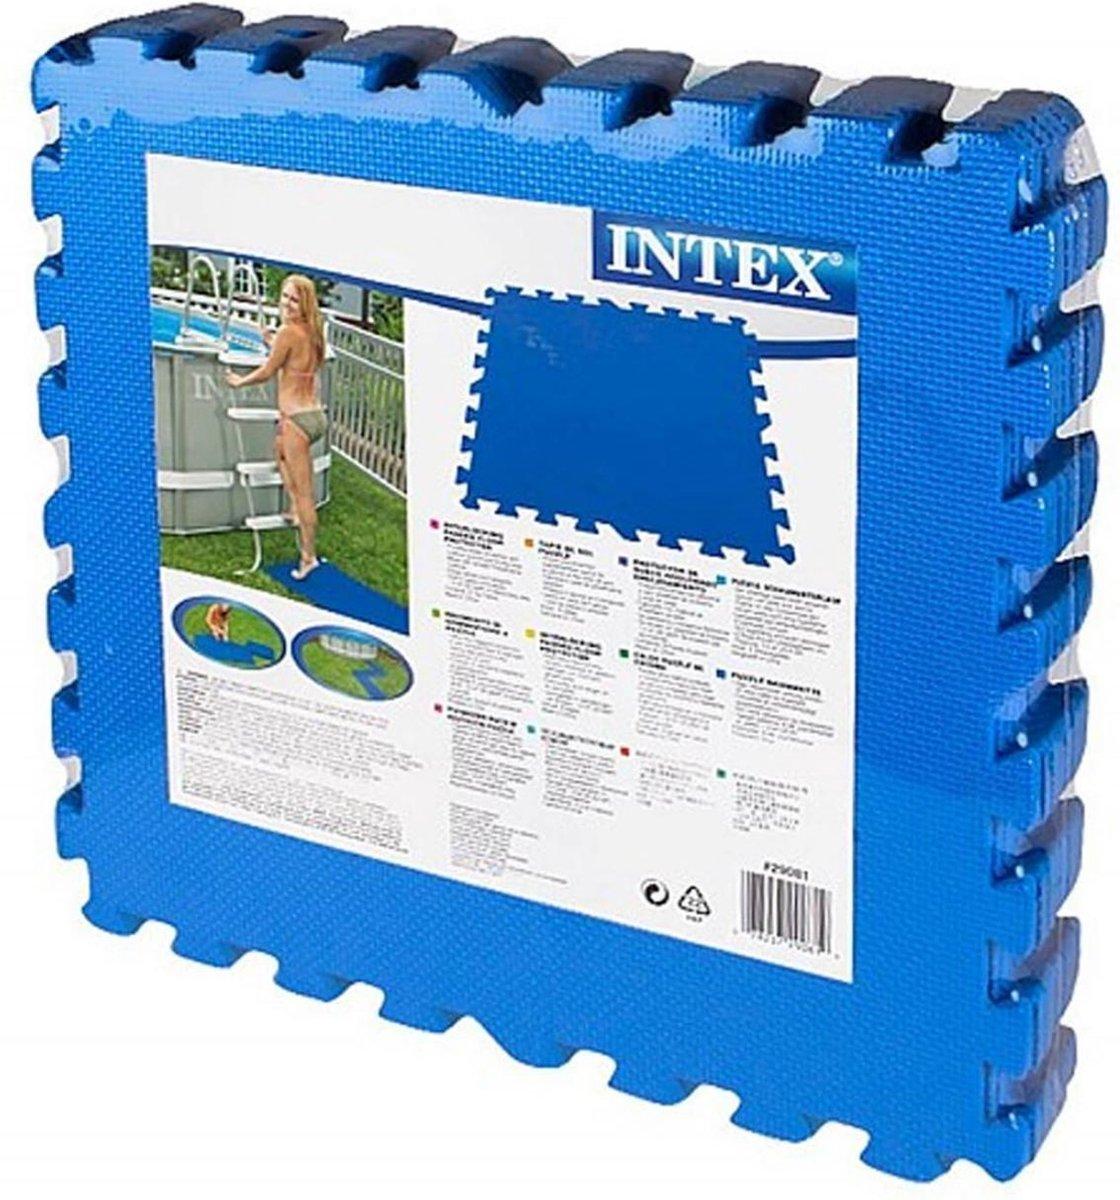 Intex - zwembad tegels - blauw - 50 x 50 cm - 8 tegels - 2 m2 - zwembad ondertegels